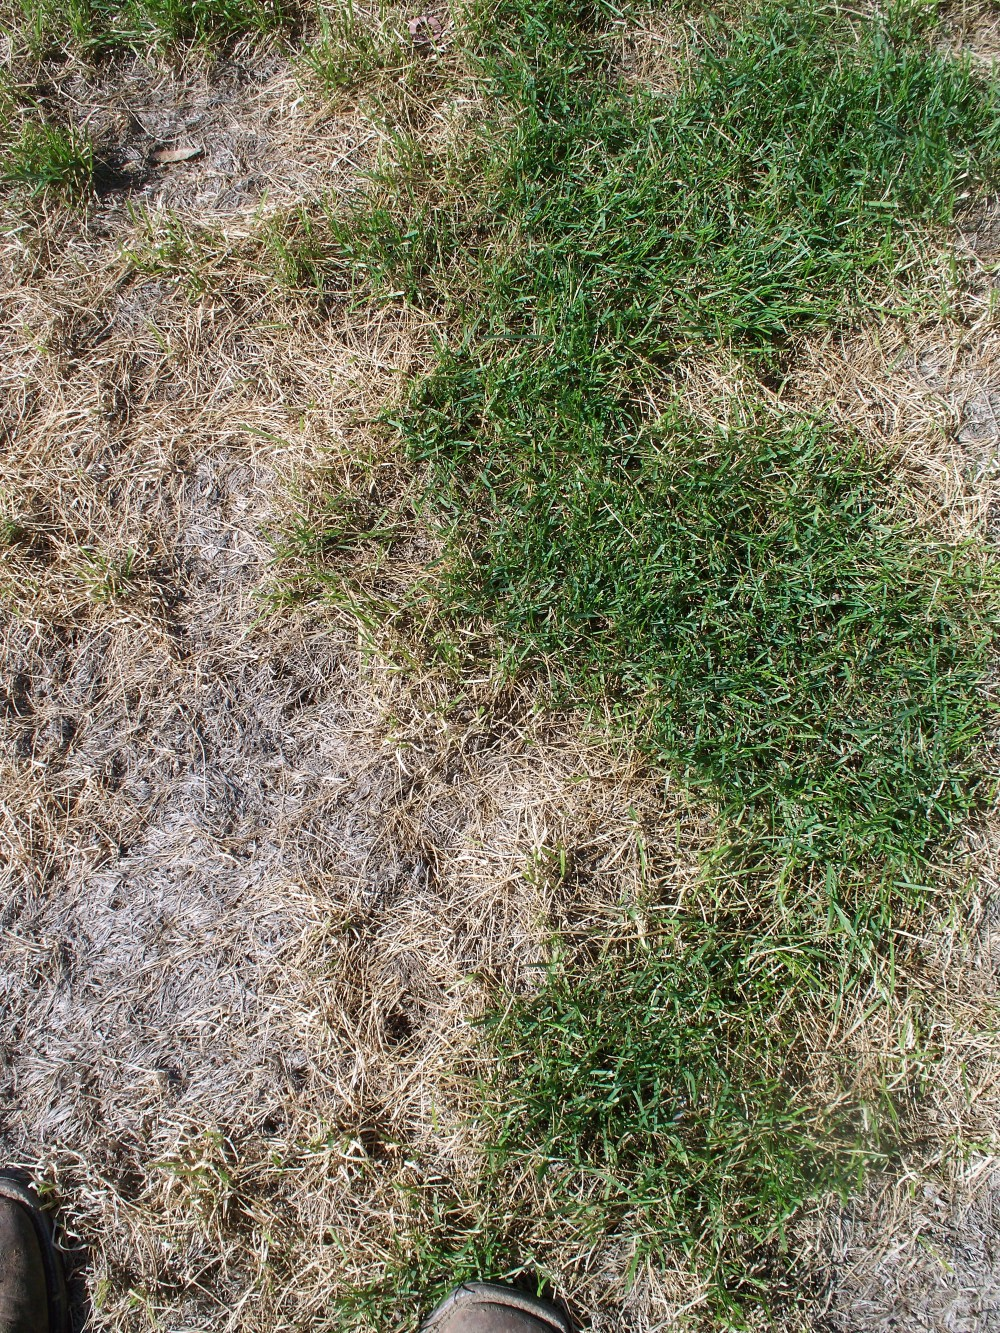 matted turf brian strauch (2).jpg